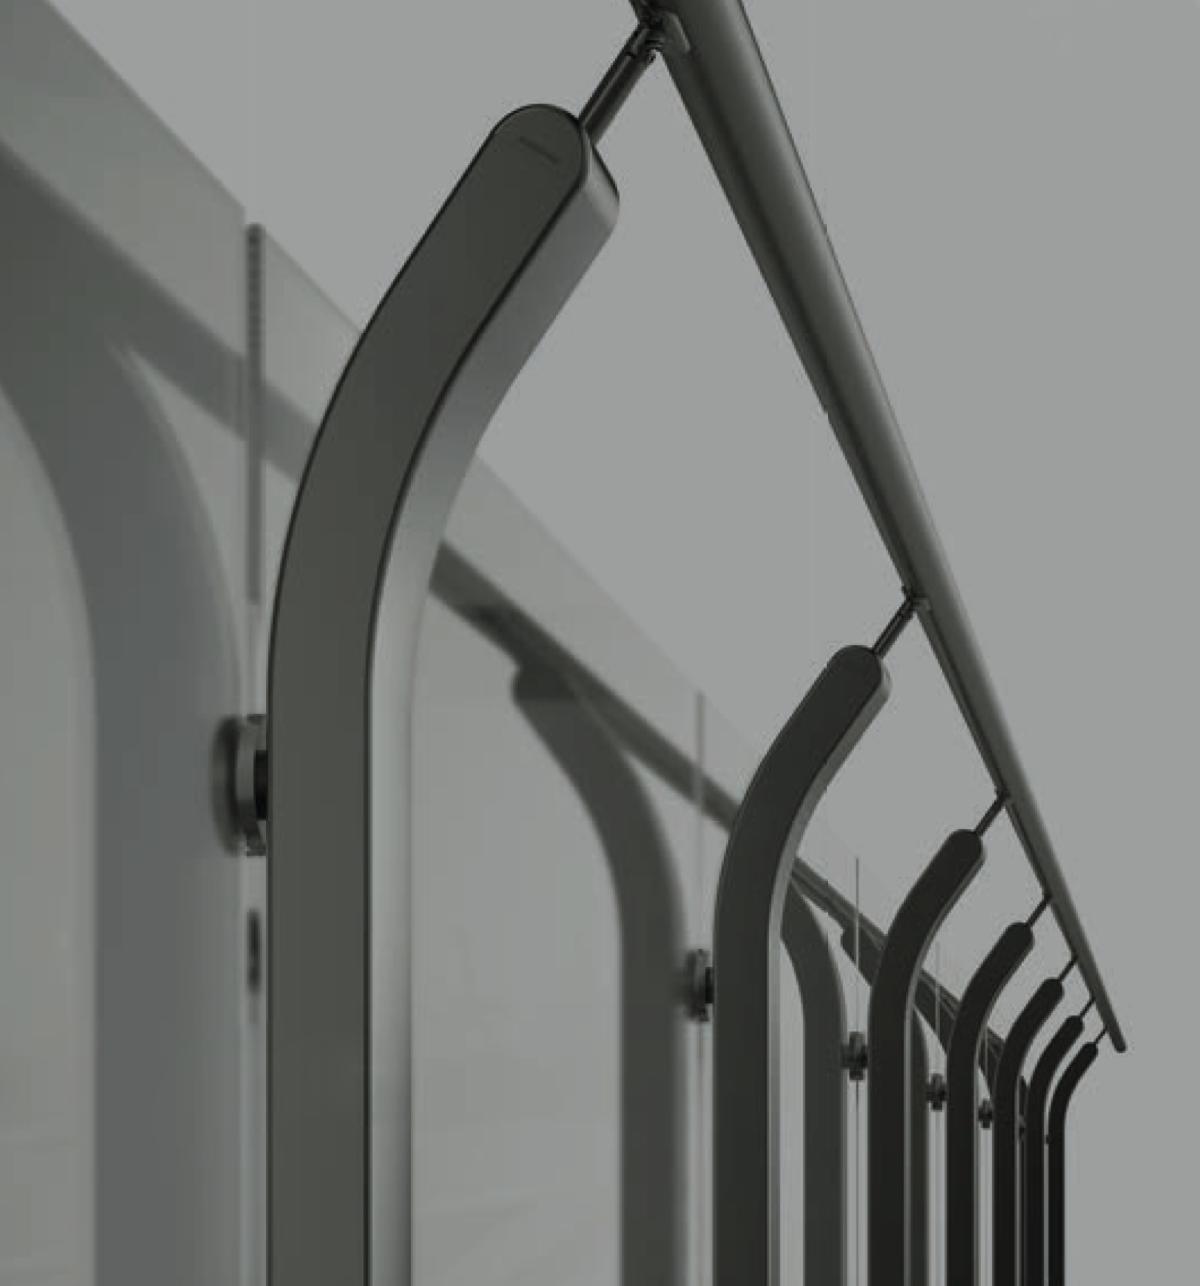 Banister - Mobirolo  - Antonio Lanzillo & Partners - 2013